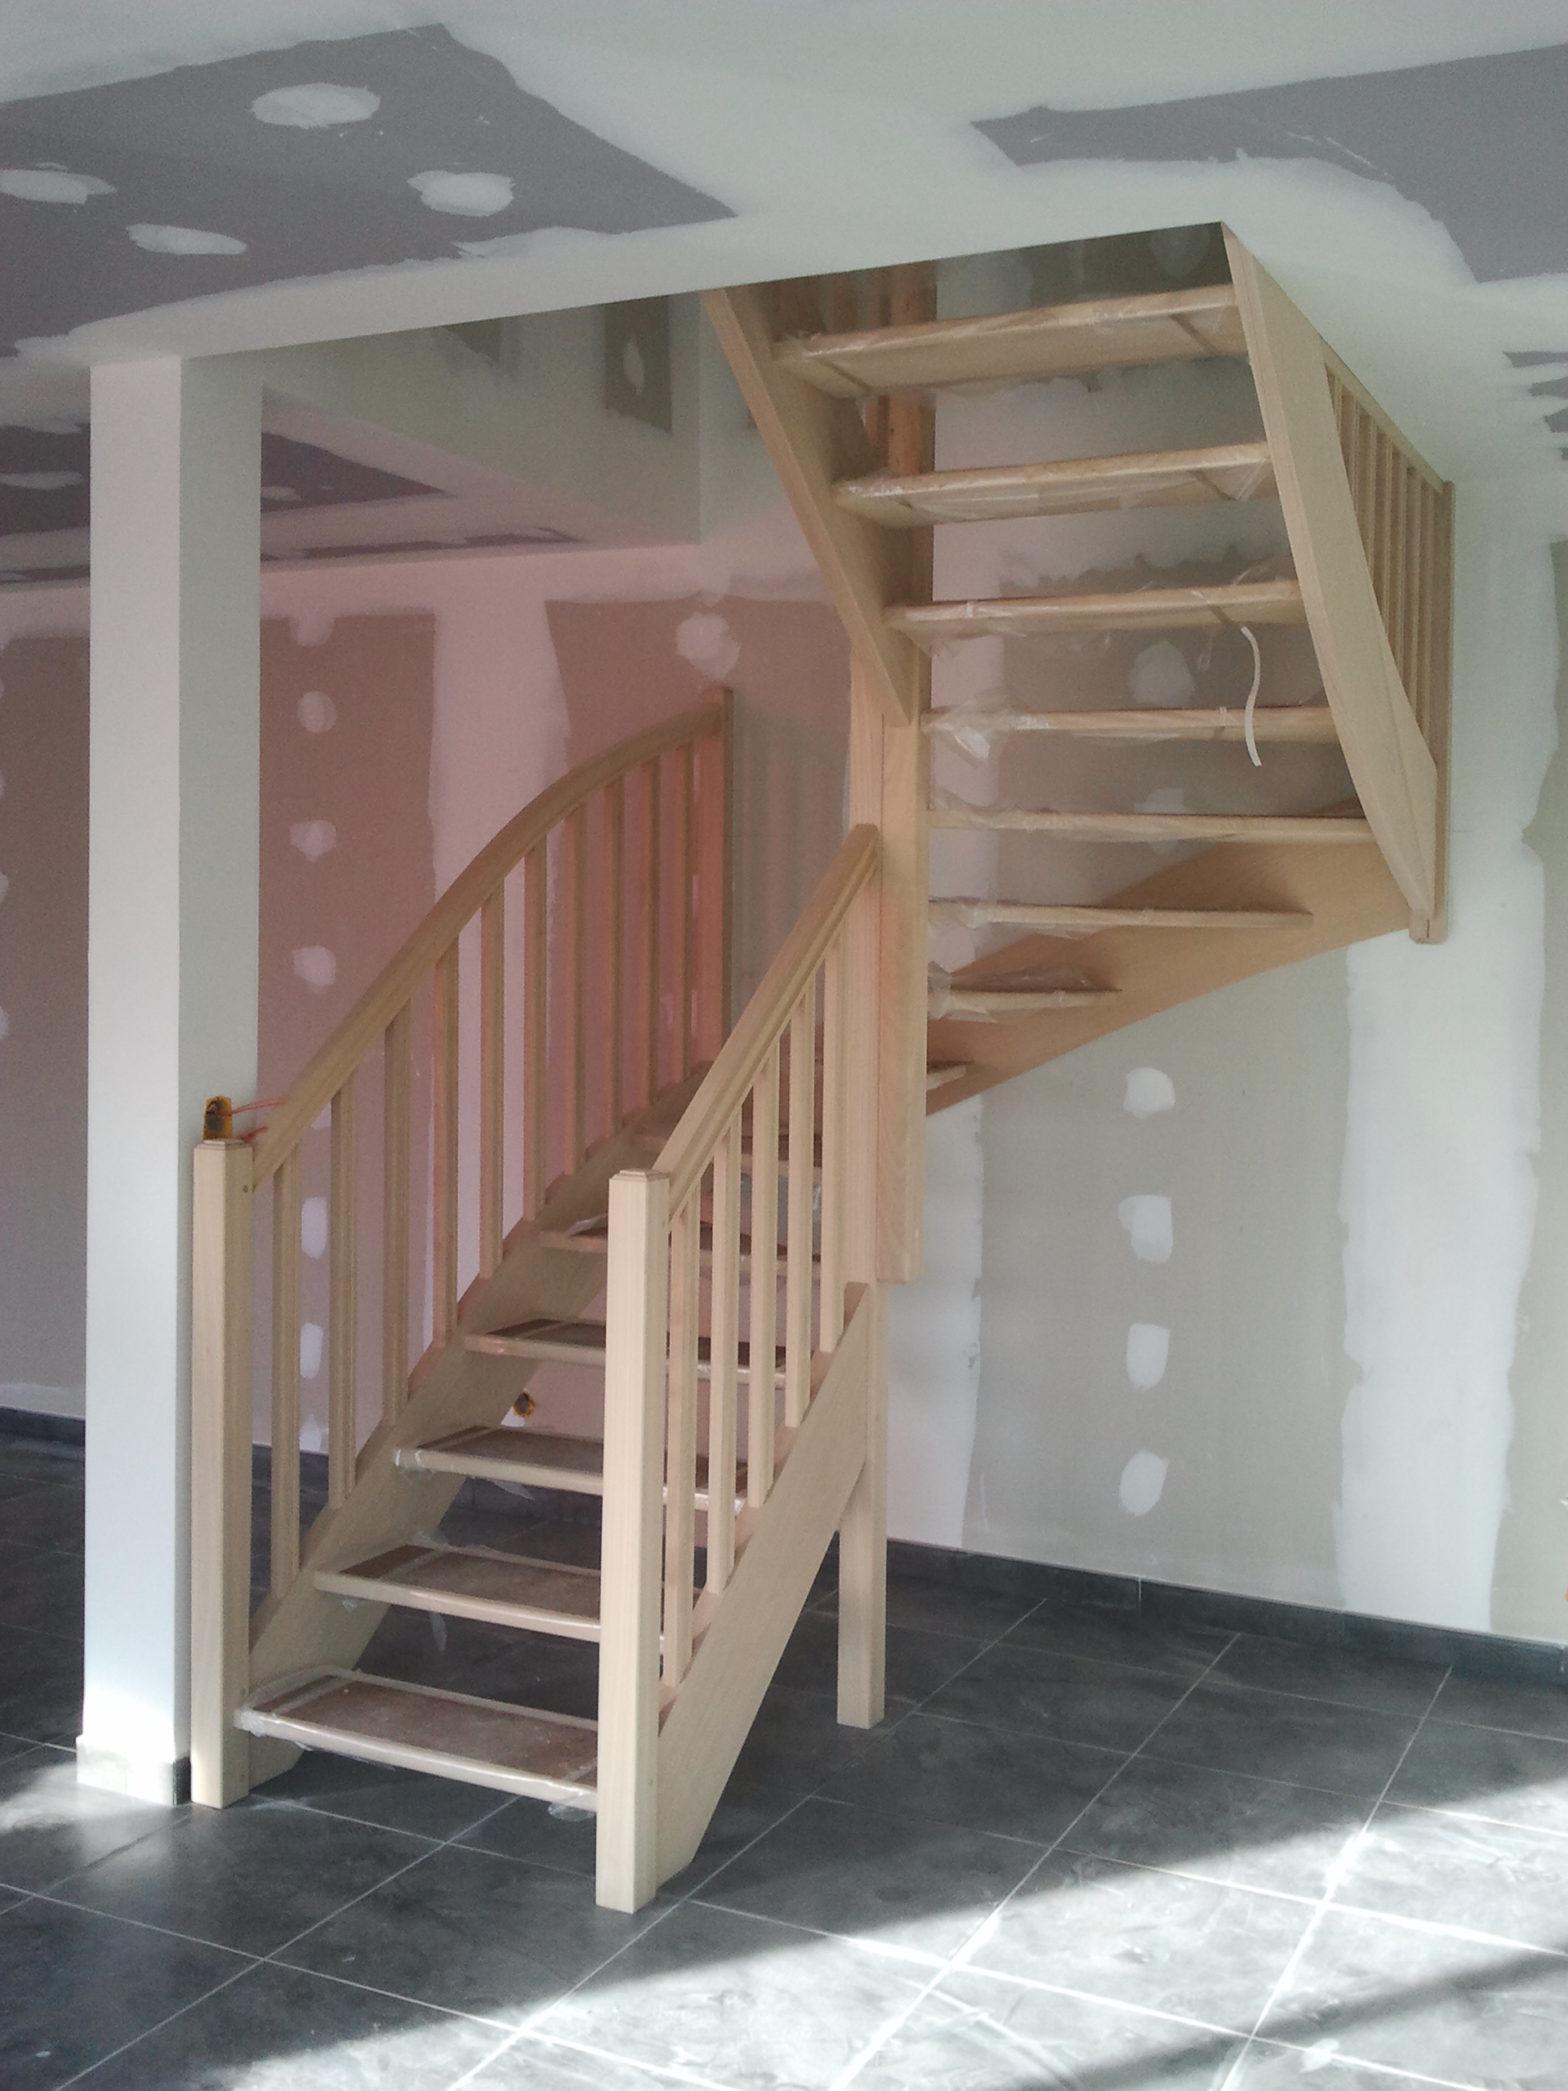 scalier-double-quart-tournant-riaux-escalier-49124-Saint-barthelemy-danjou